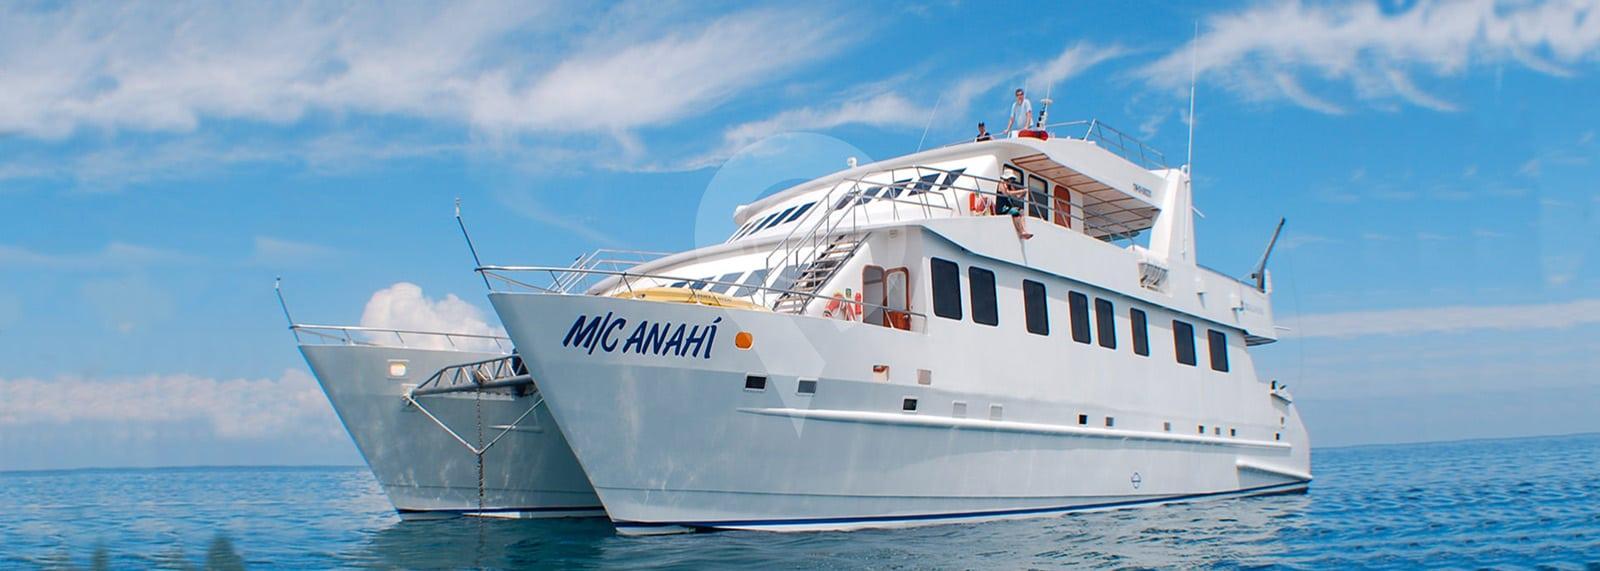 Anahi Galapagos Catamaran